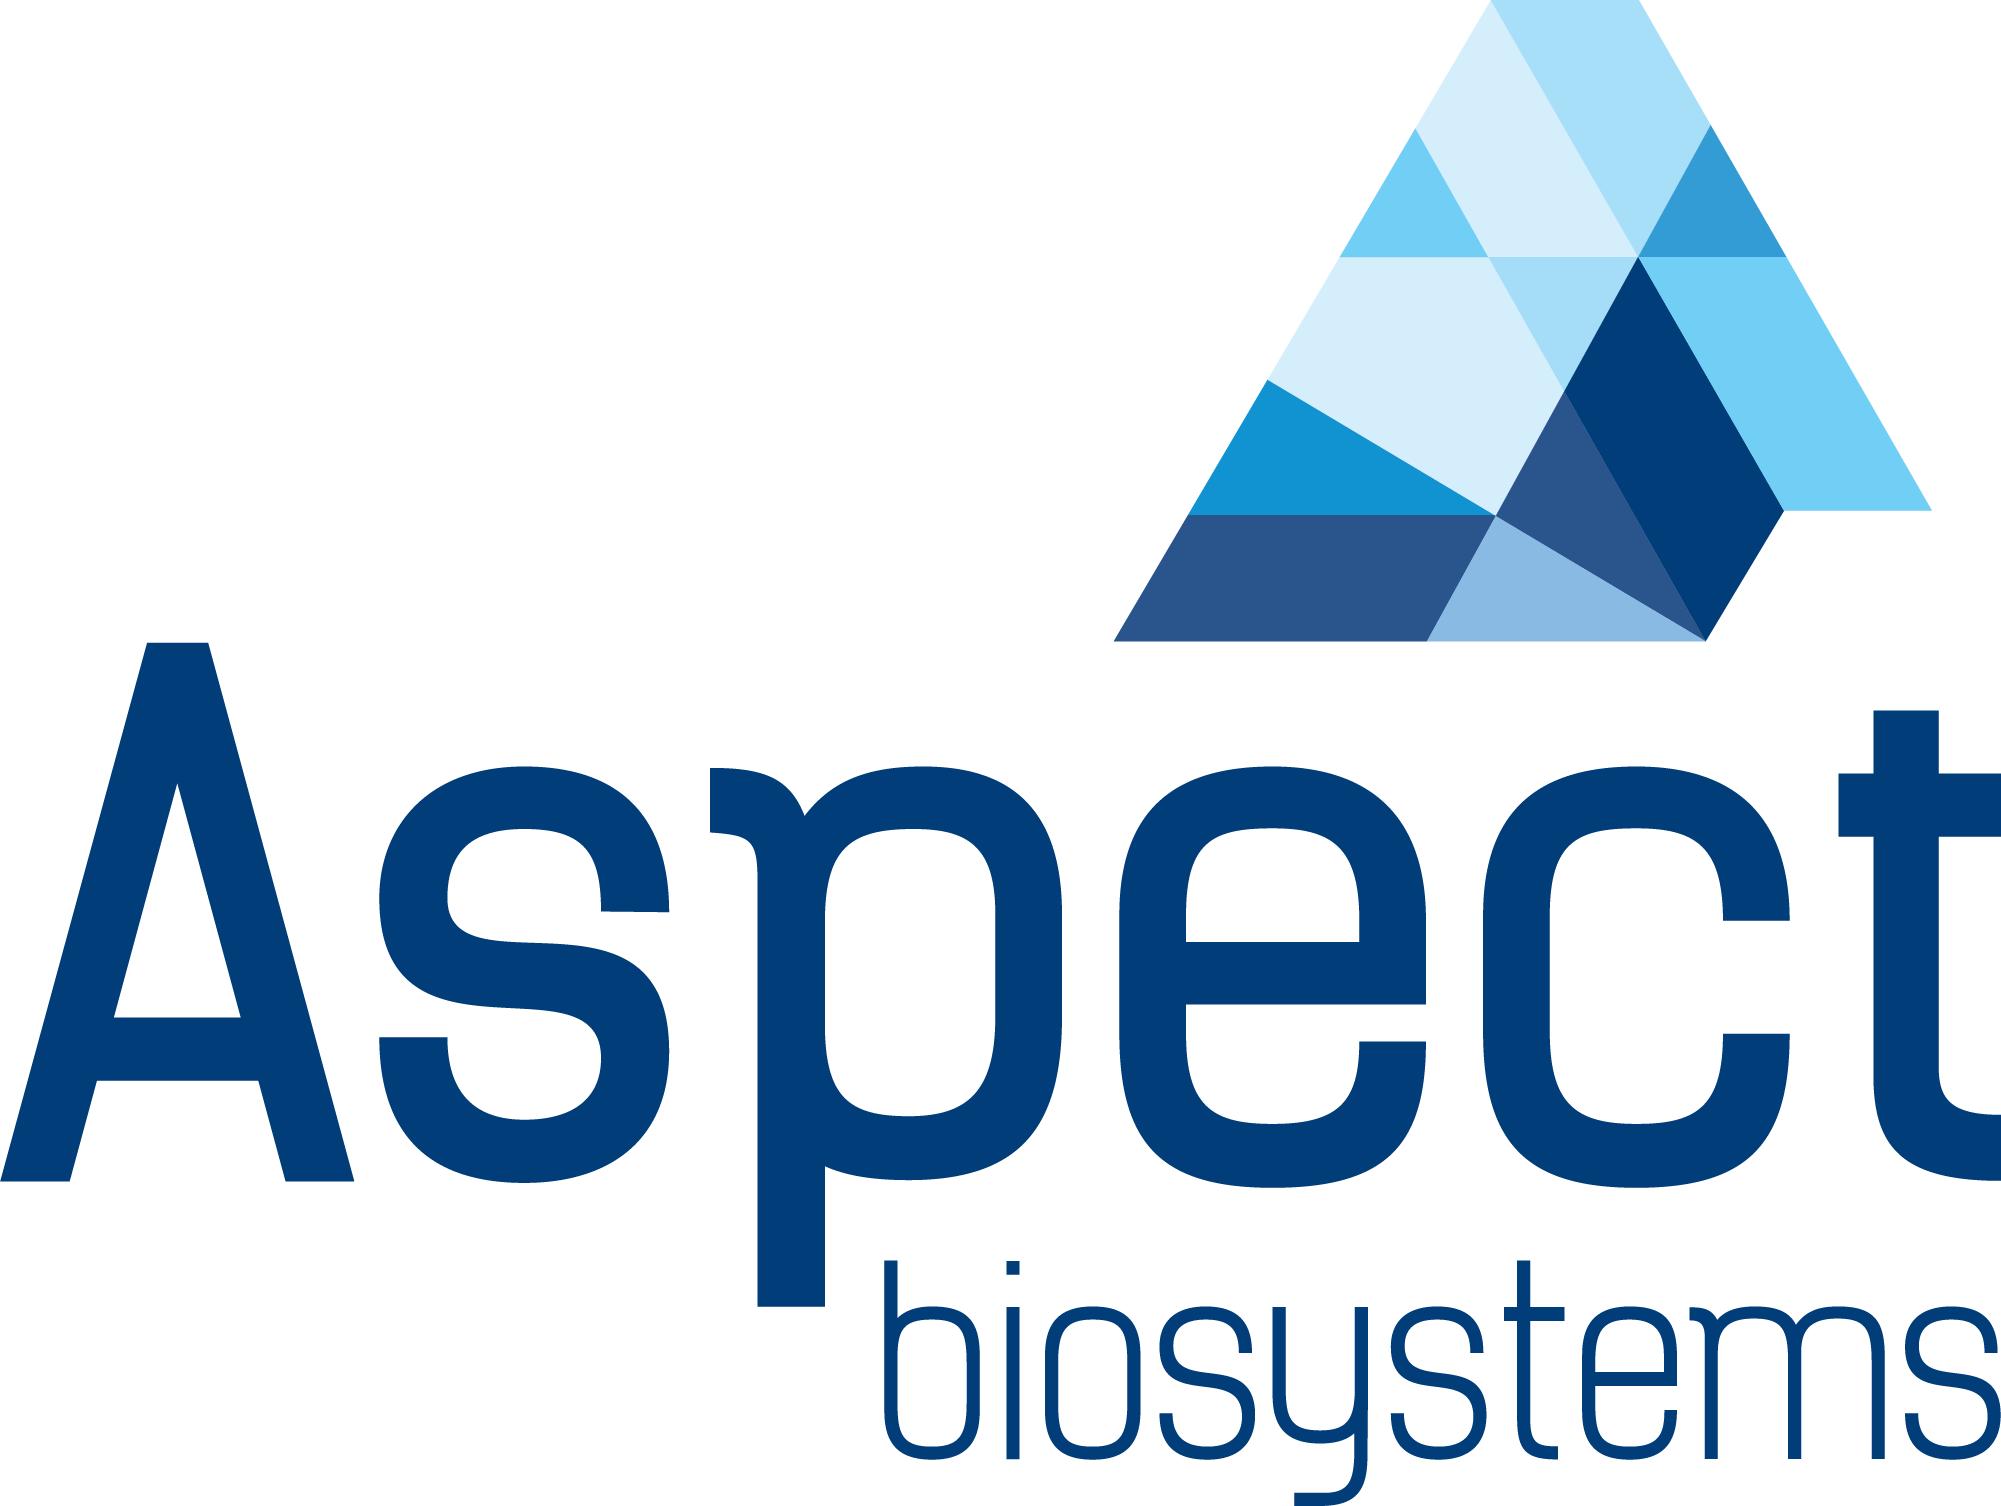 Aspect Biosystems logo